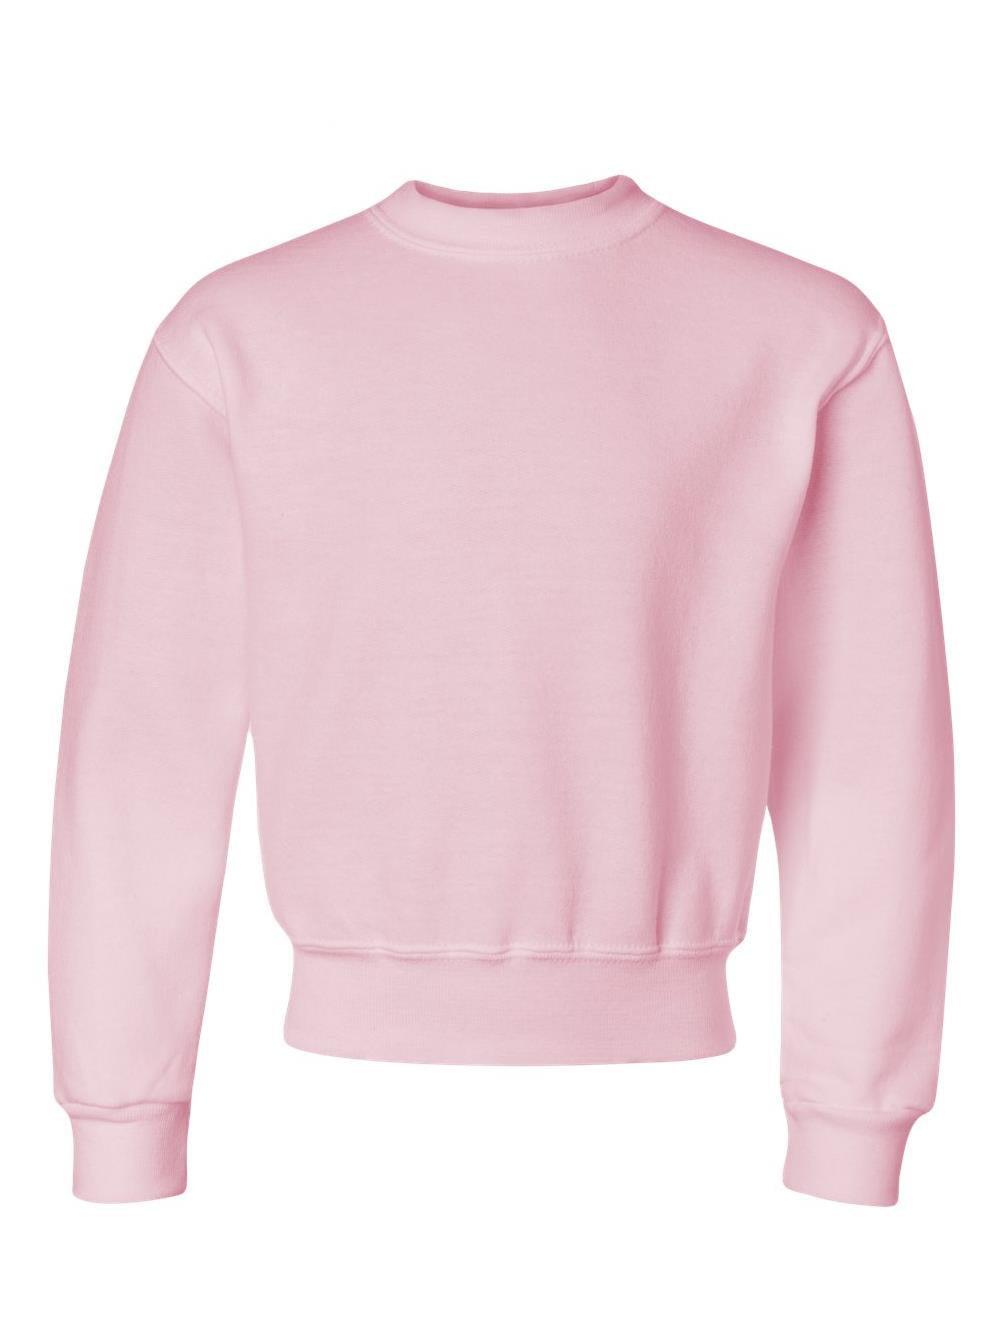 Jerzees NuBlend Youth Crewneck Sweatshirt